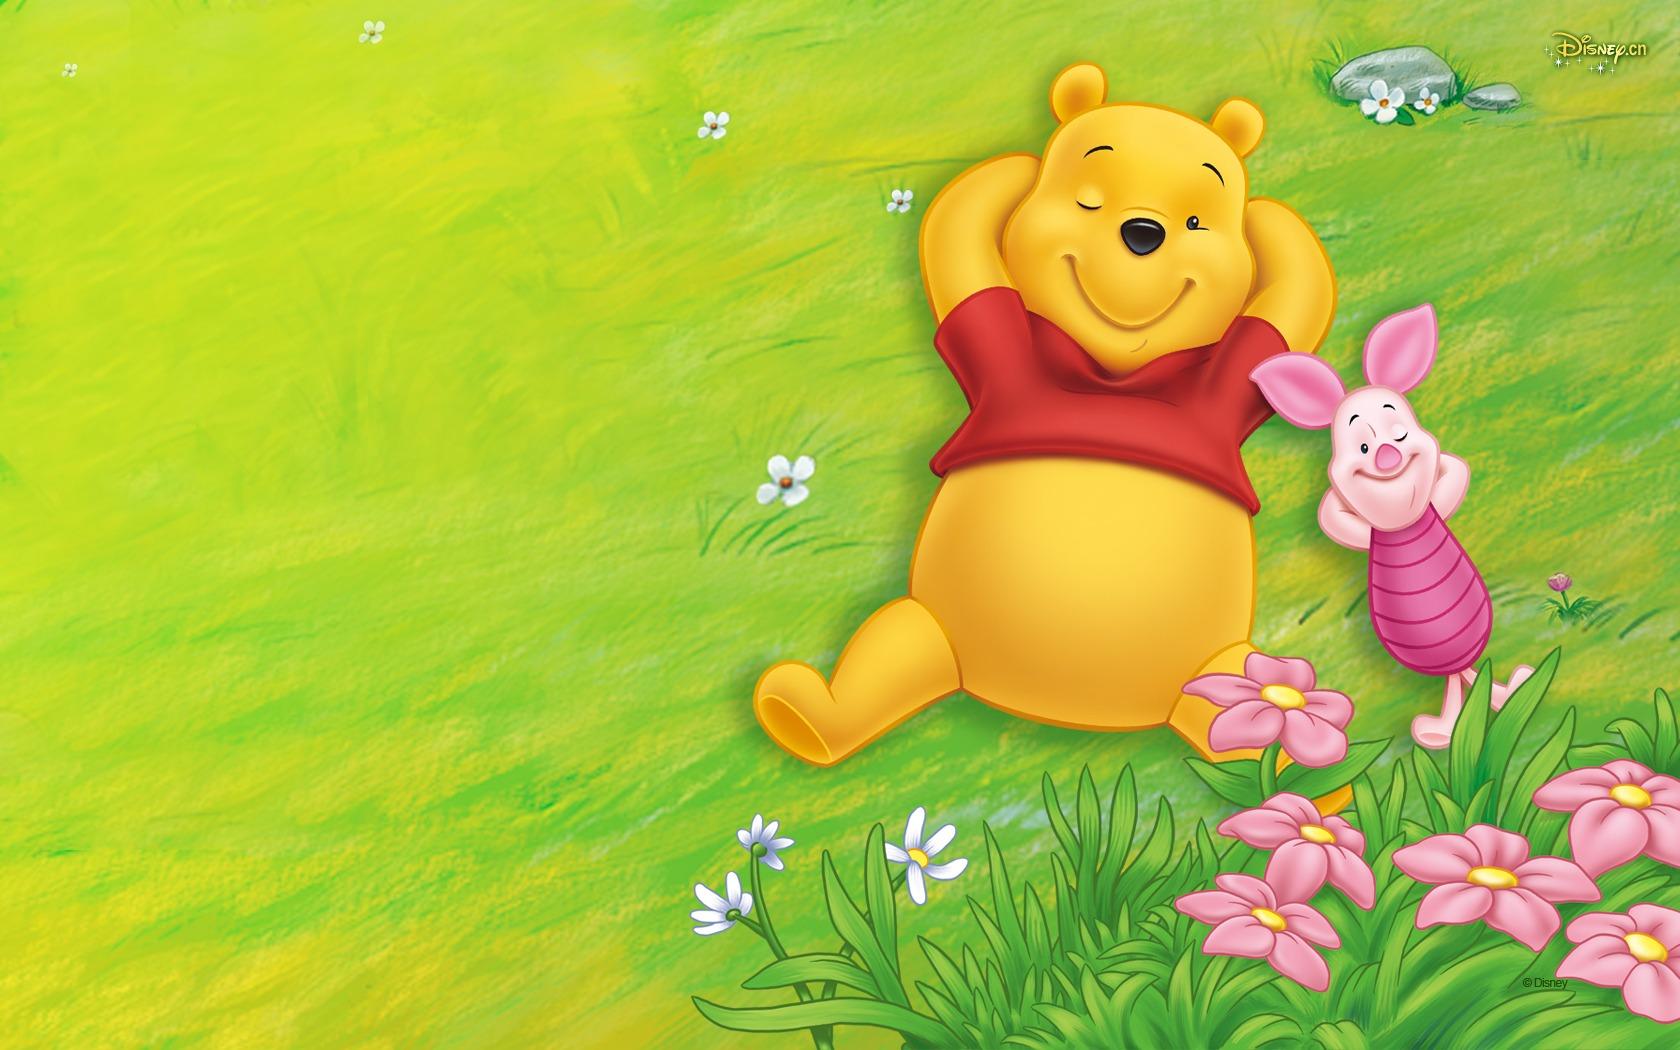 Disney Winnie The Pooh Wallpaper Sf Wallpaper